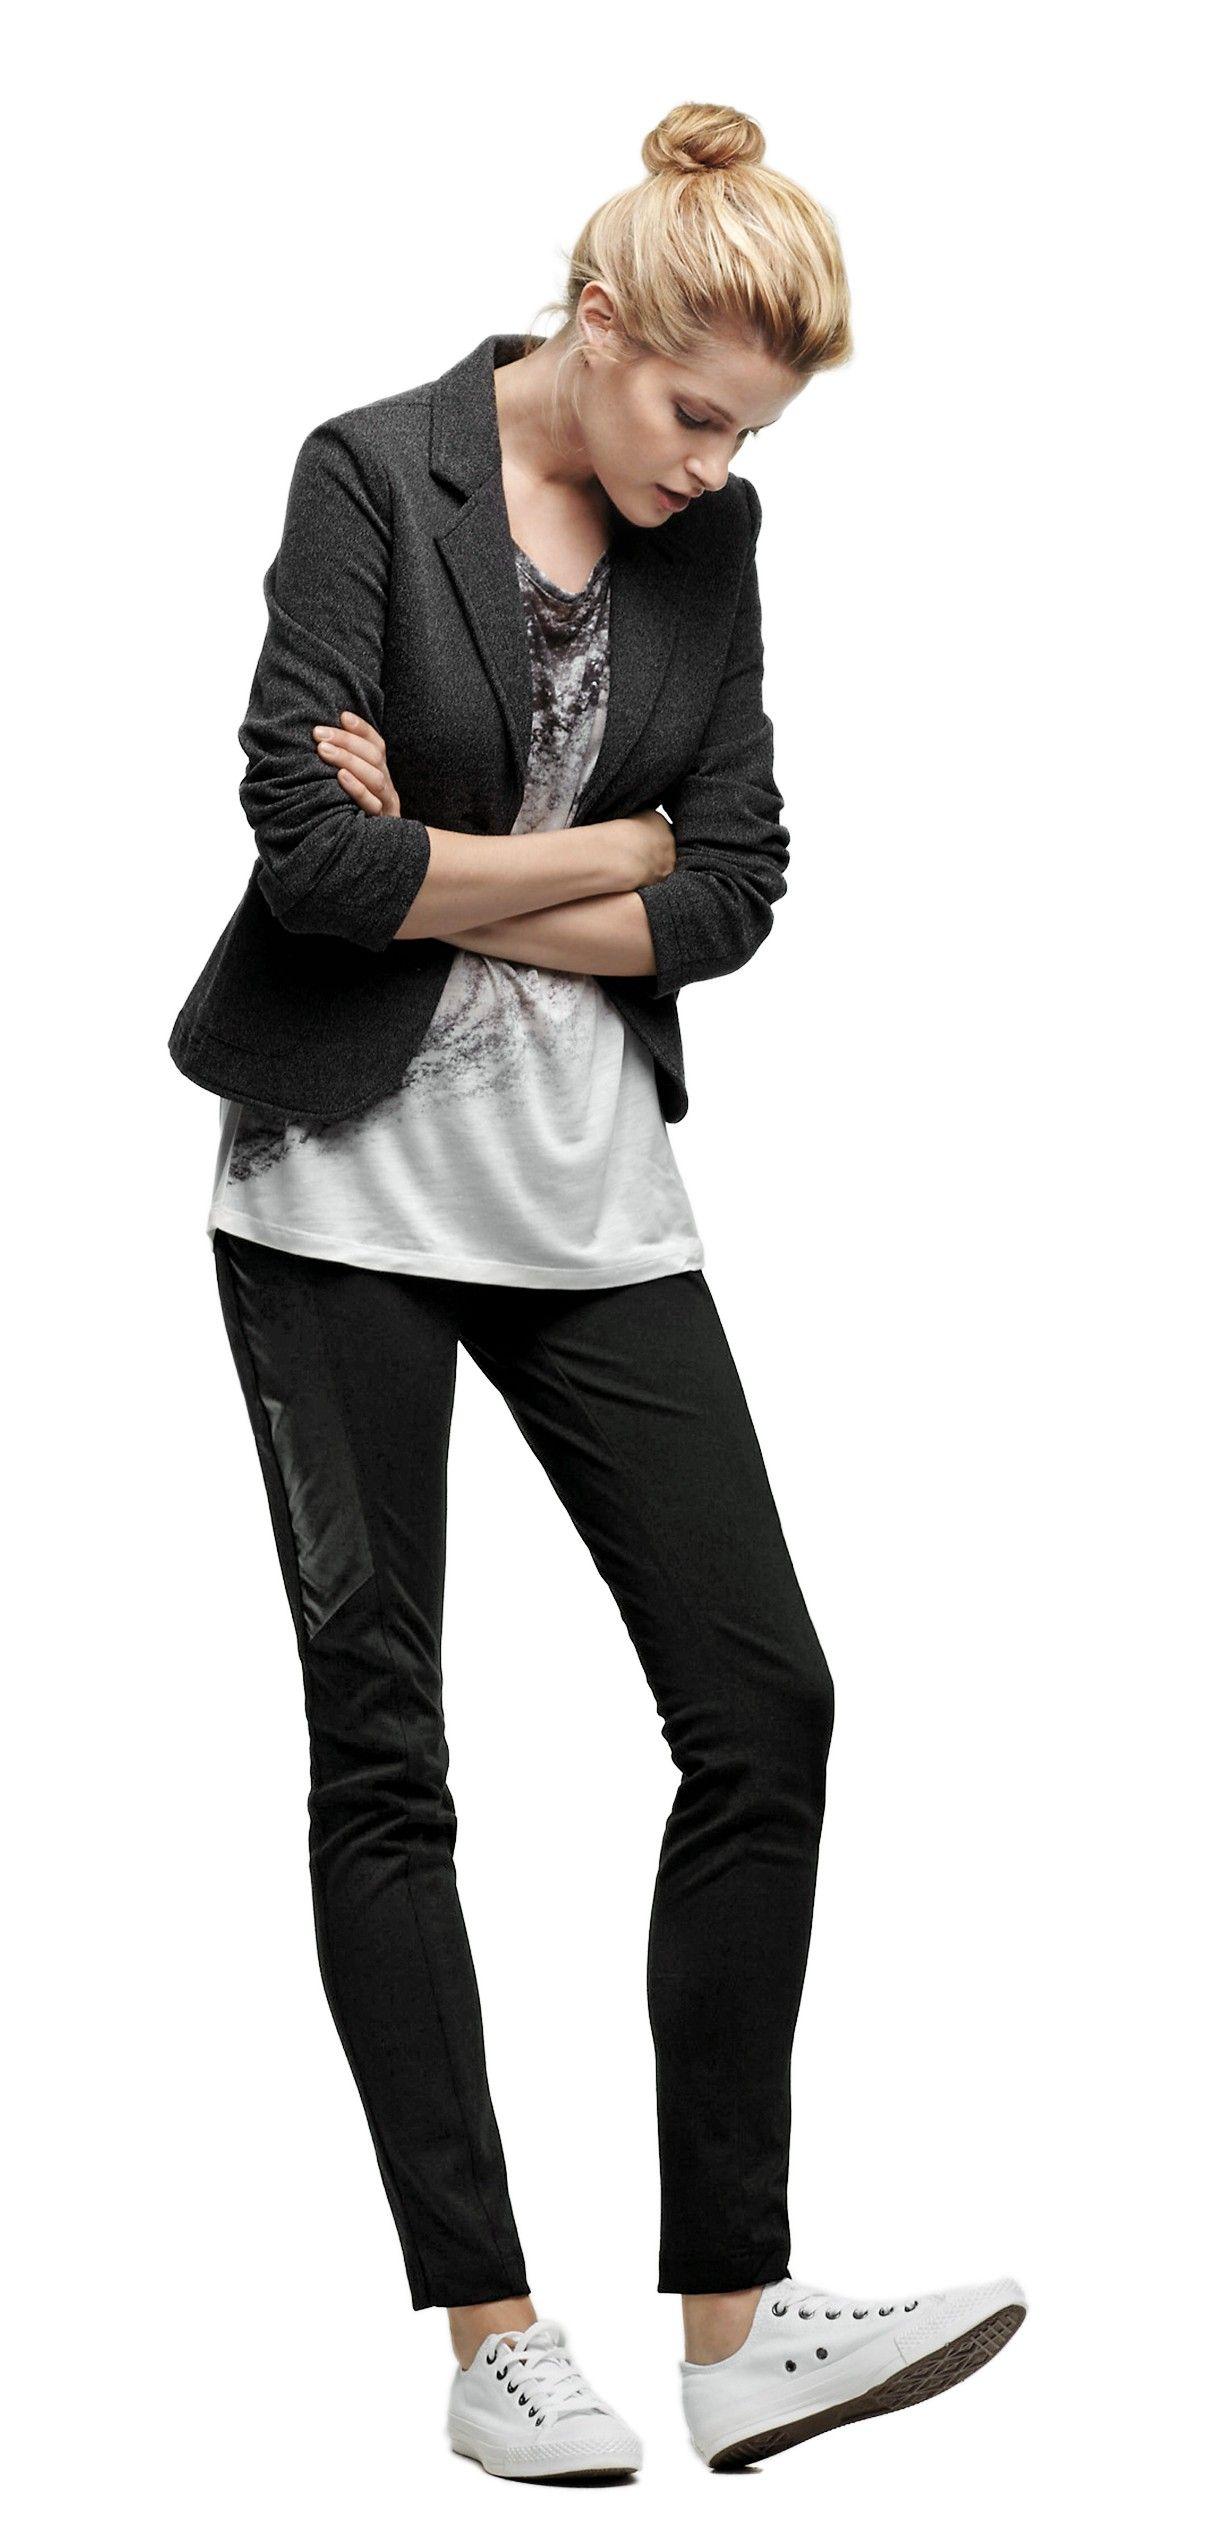 Samora Outfits Opus Fashion Kleidung Online Kaufen Photoshop